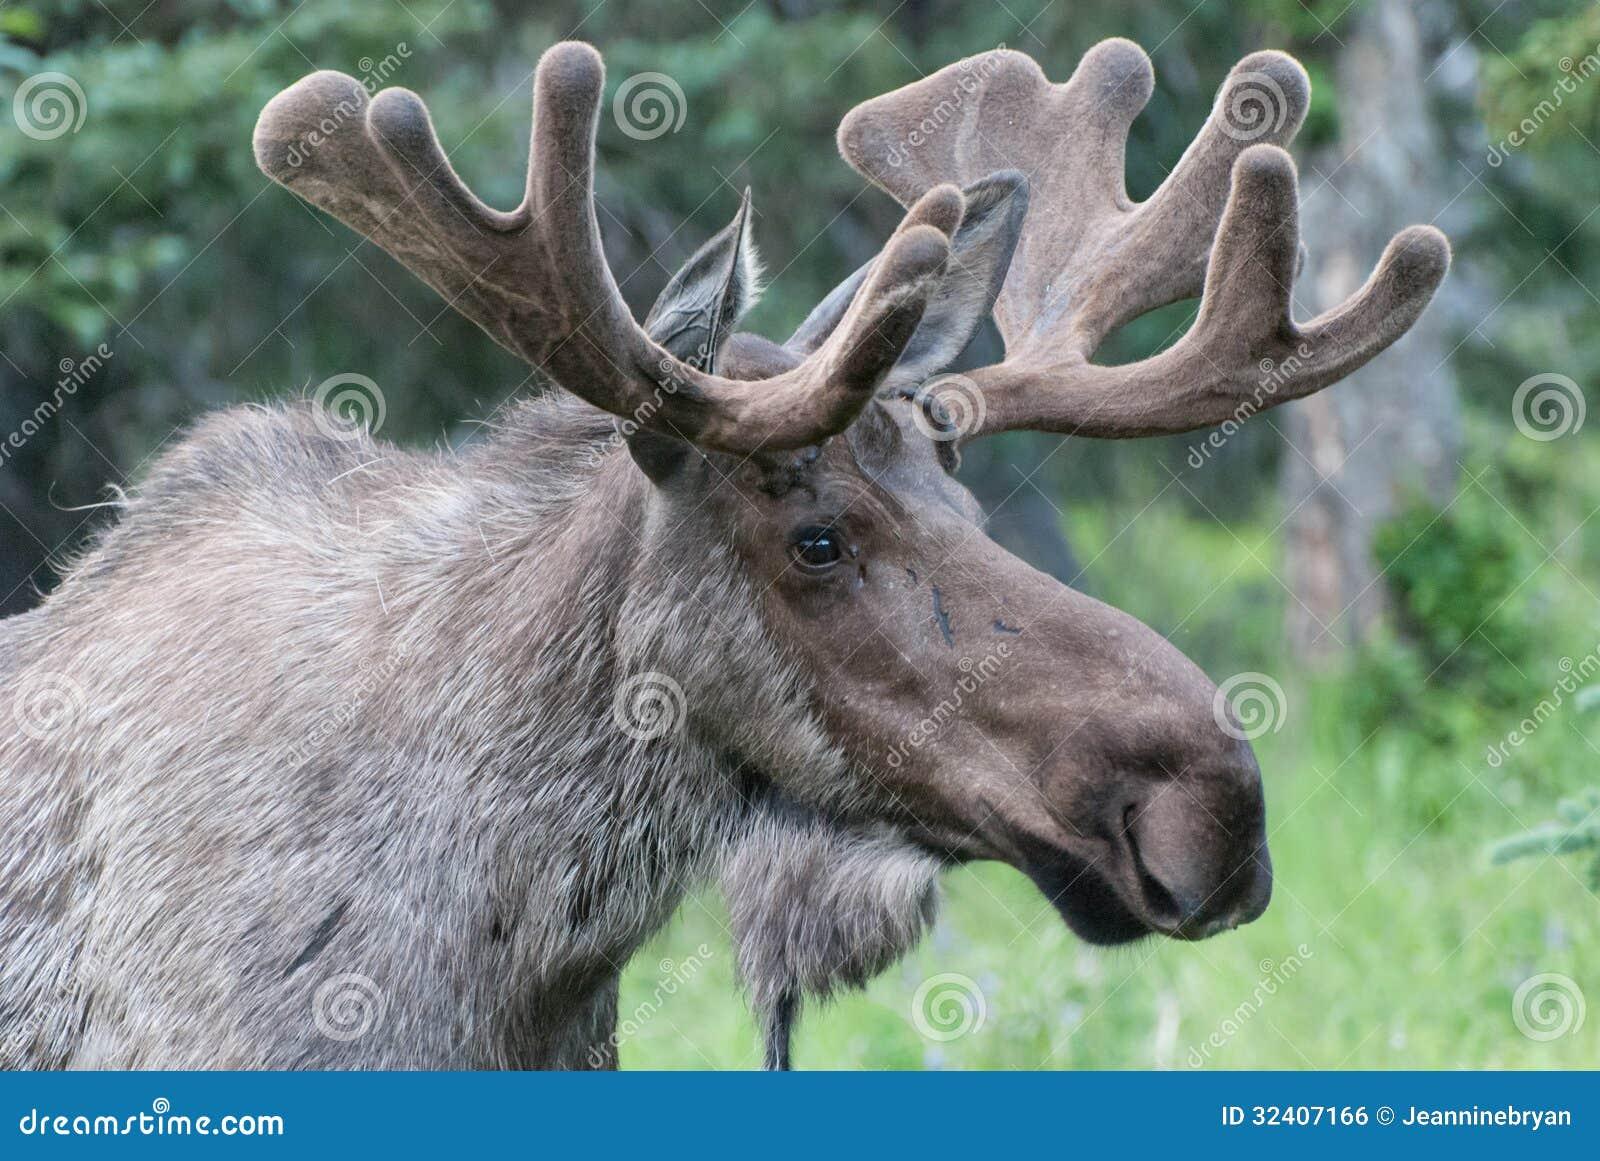 Stierenamerikaanse elanden